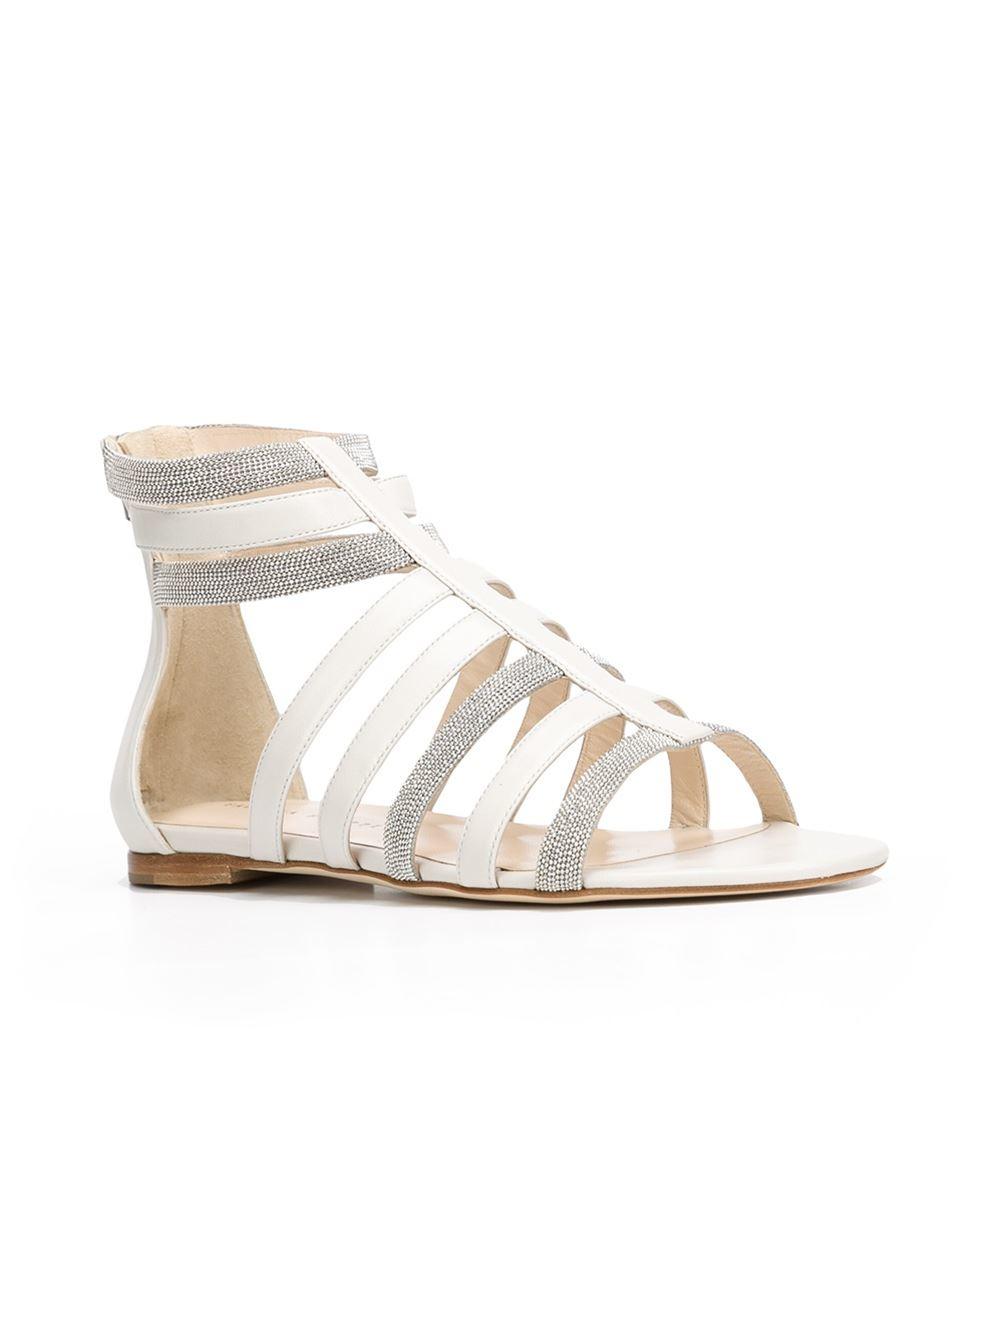 Fabiana Filippi Anastasia Gladiator Sandals In Metallic